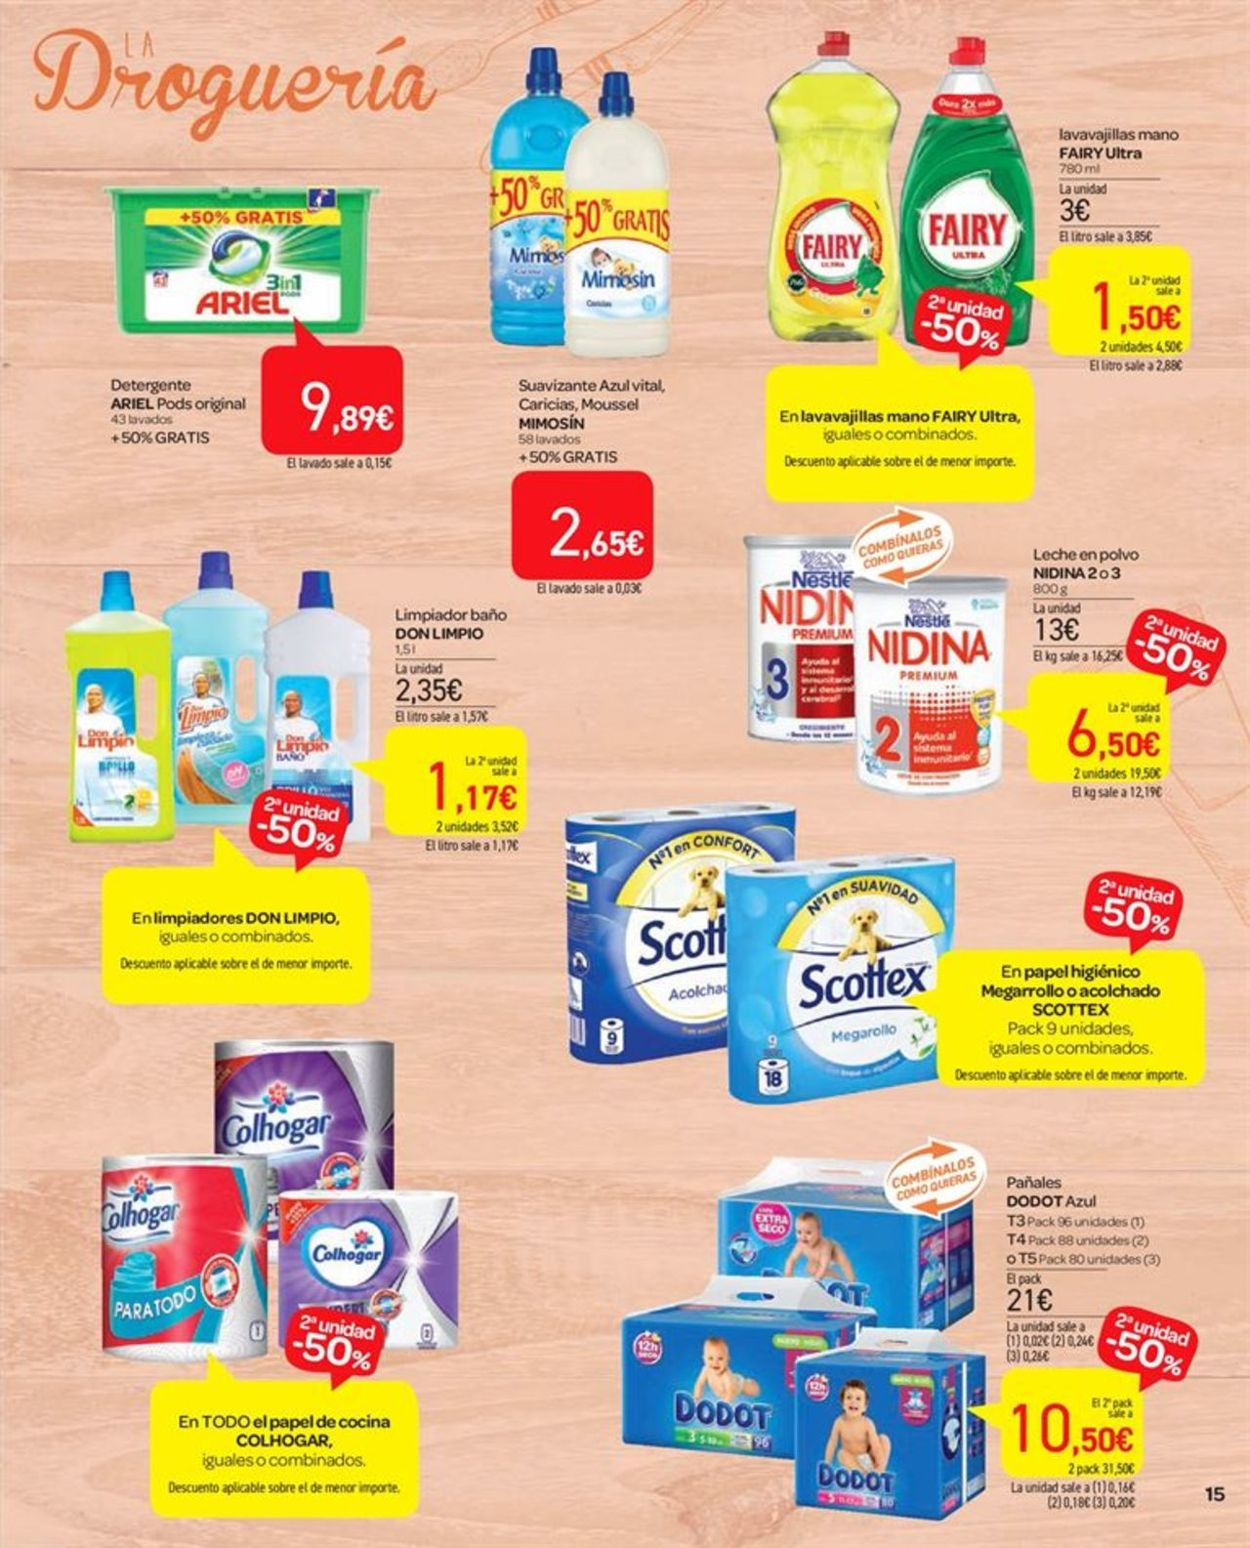 Carrefour Folleto - 10.05-21.05.2019 (Página 15)